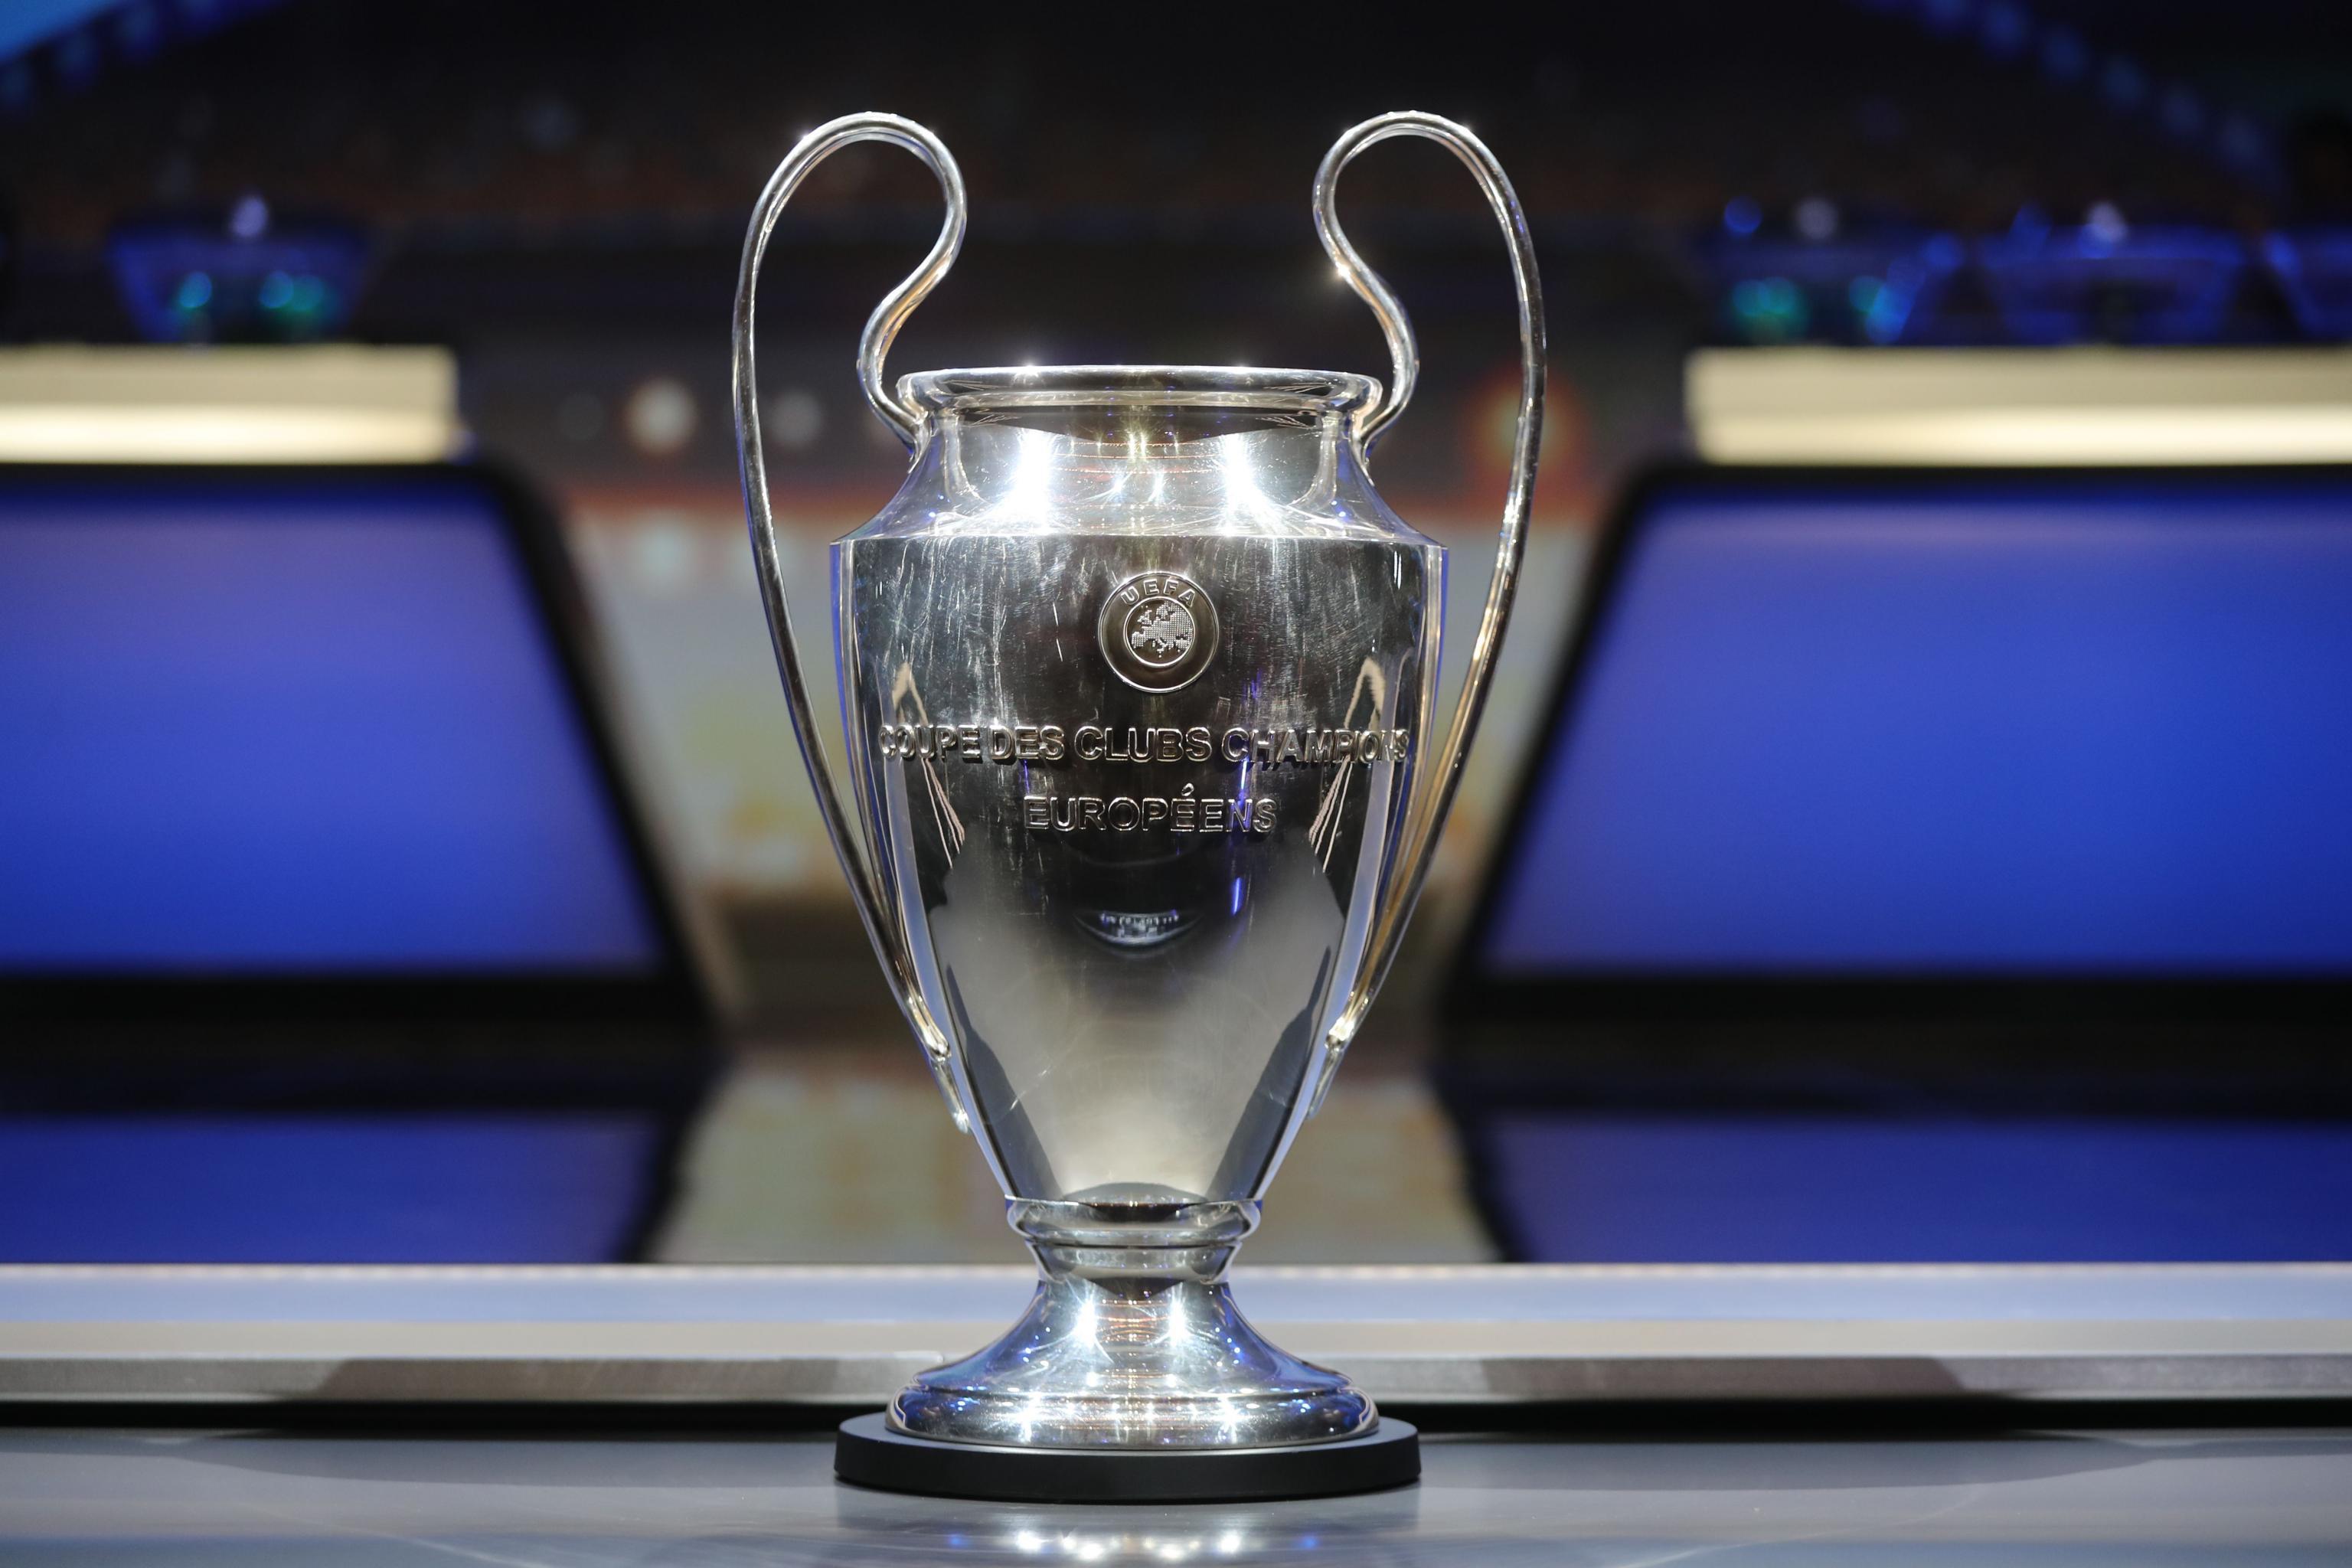 2017 uefa champions league group stage fixtures schedule tv info bleacher report latest news videos and highlights 2017 uefa champions league group stage